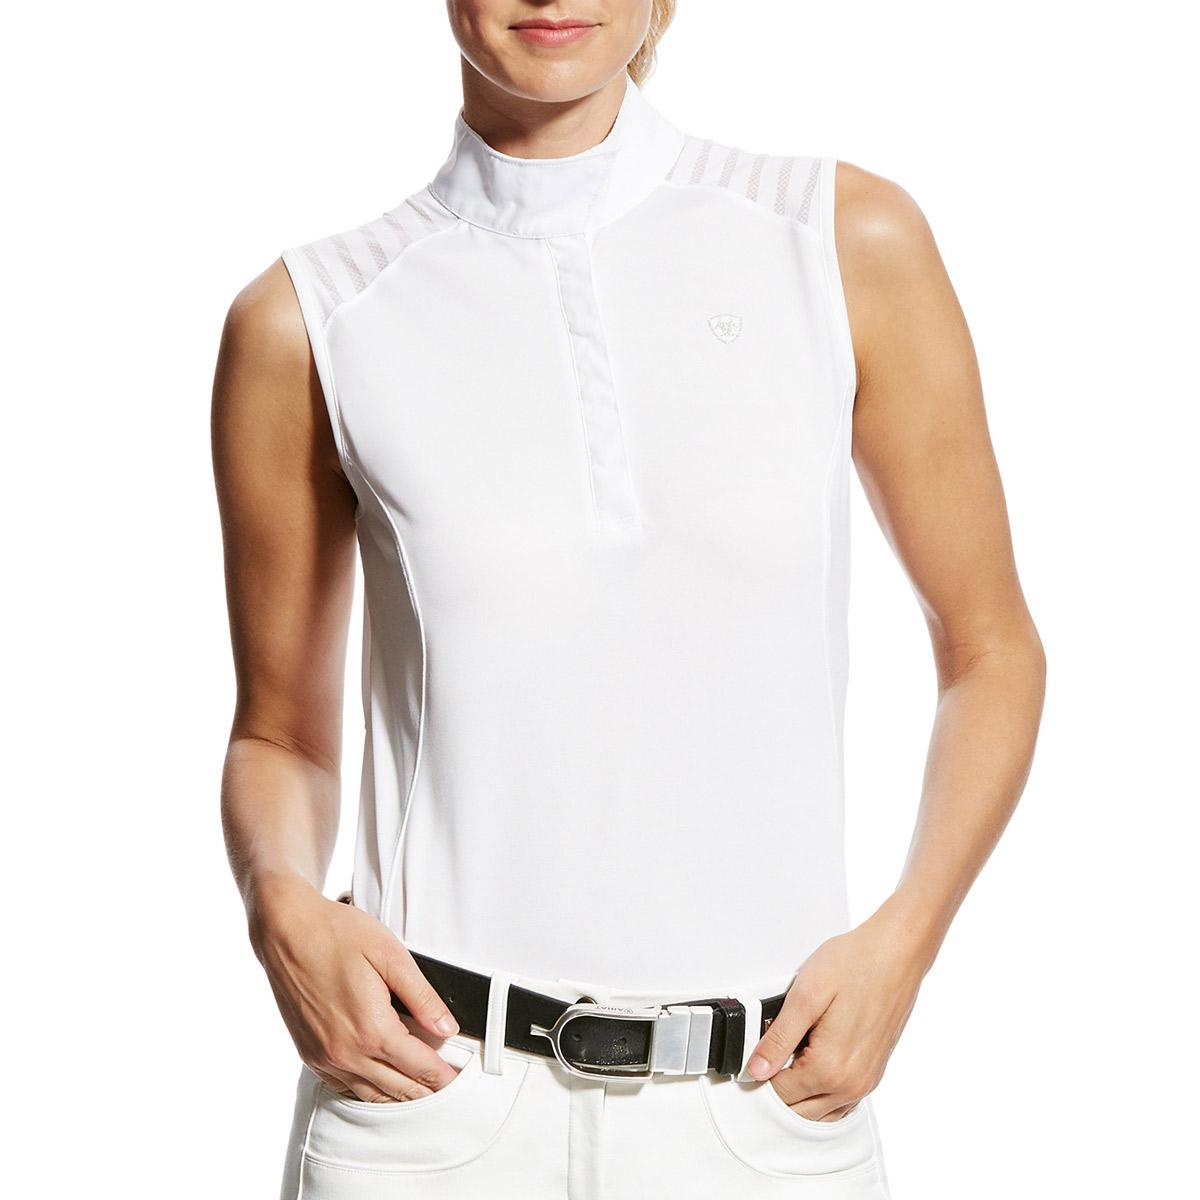 Ariat Vent White Shirt Sleeveless Competition Ladies Aptos ar5qa